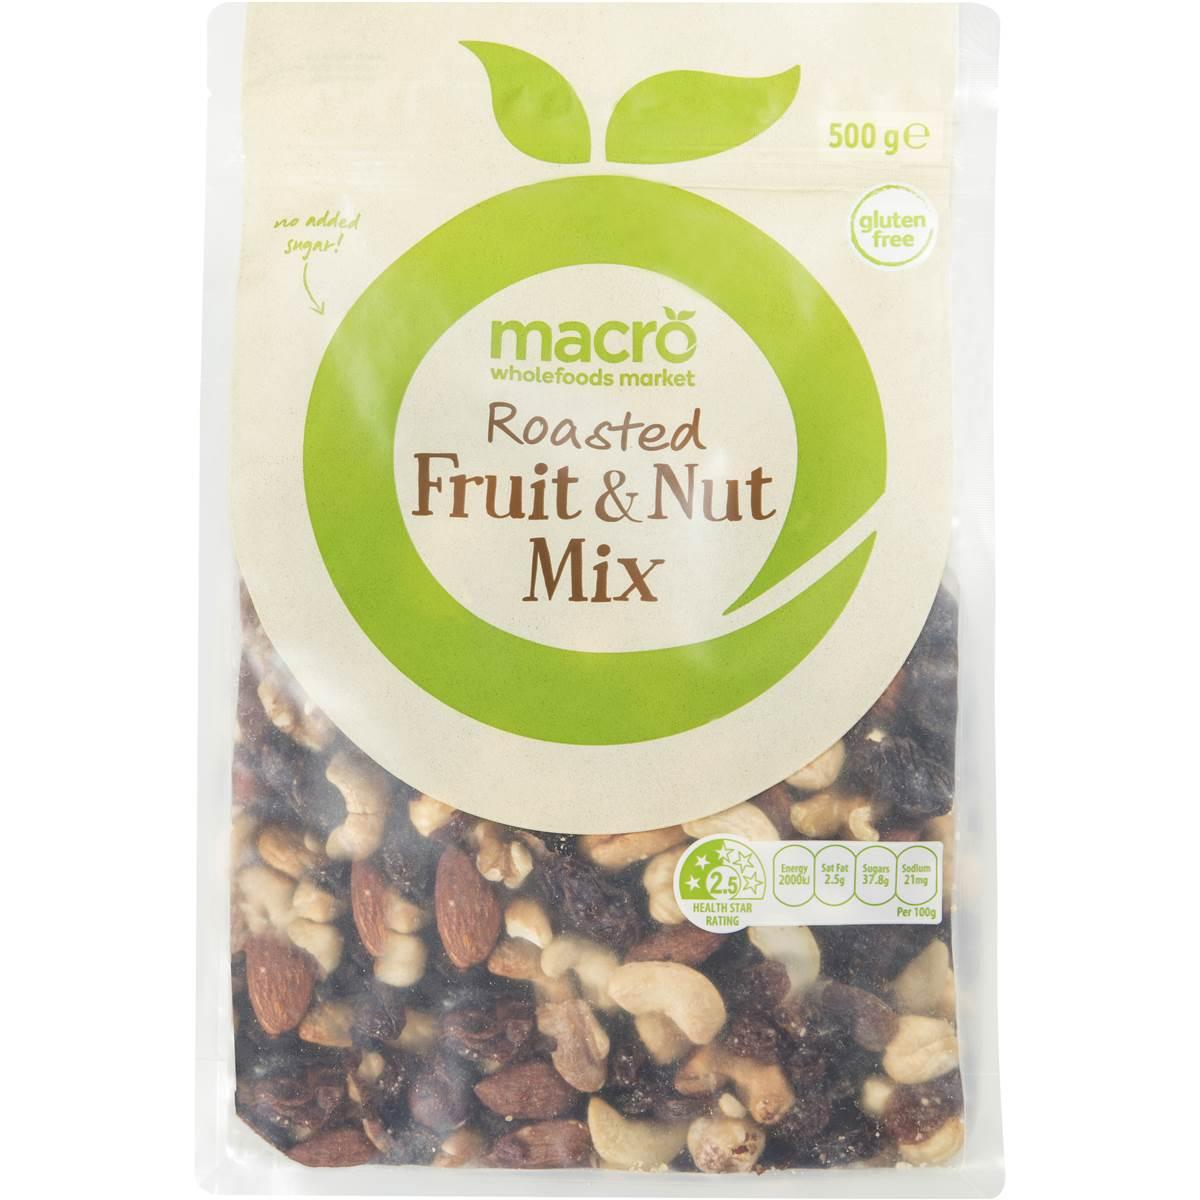 Macro Nuts Fruit & Nut Roasted 500g | Woolworths